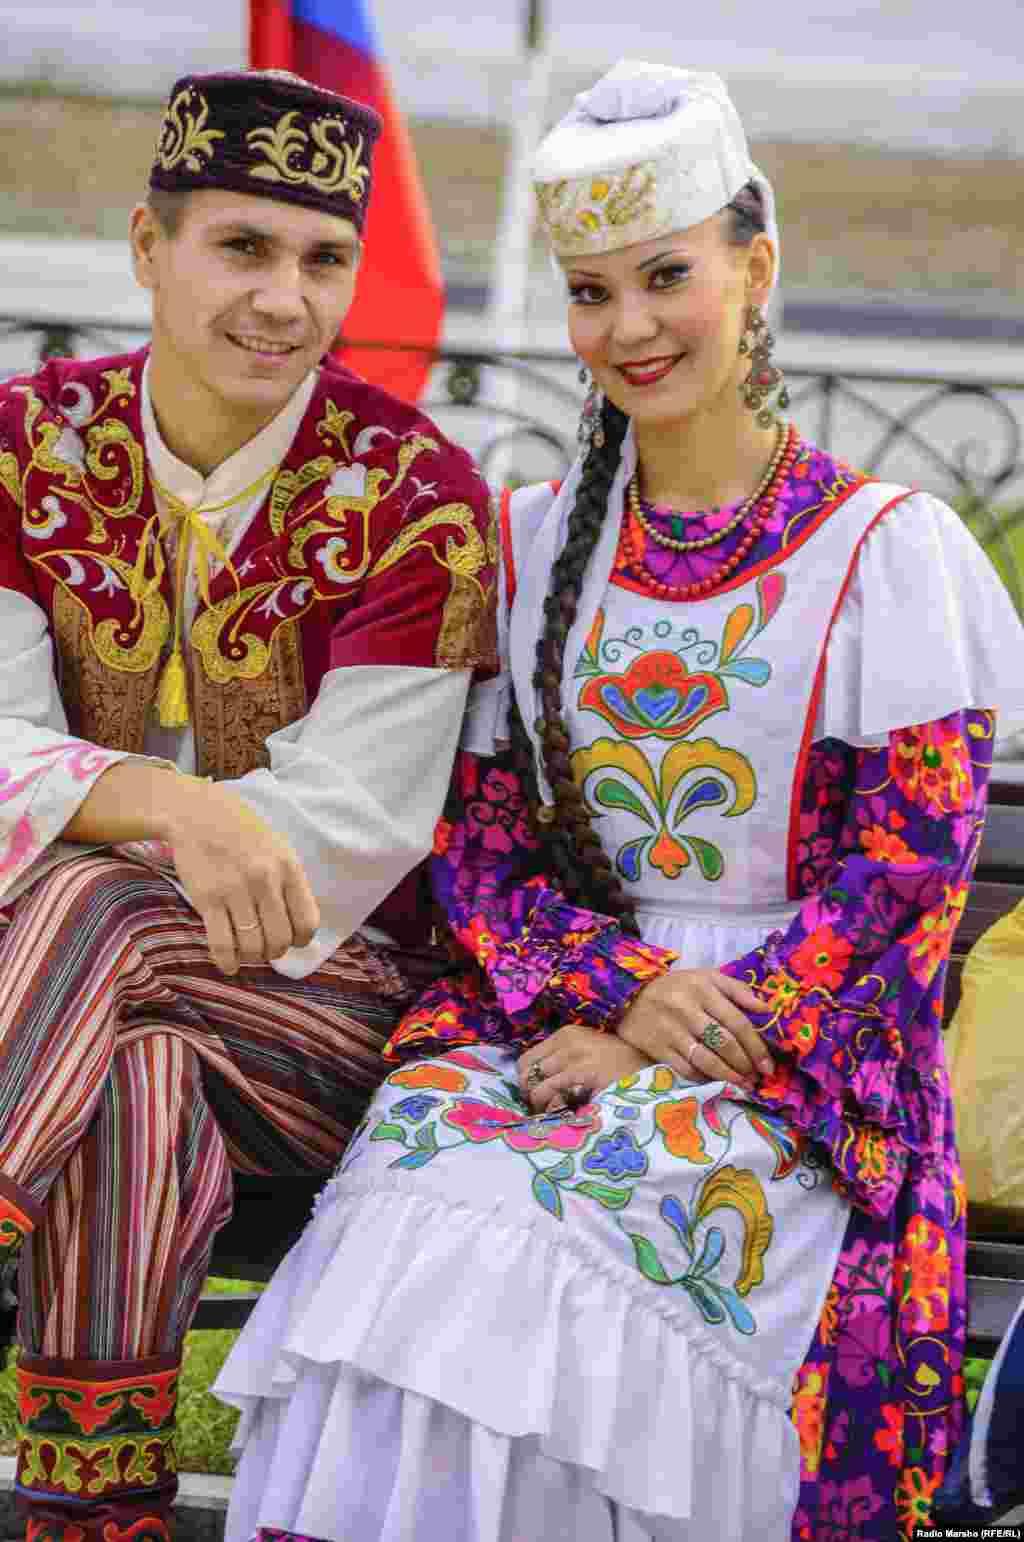 Татарстан җыр һәм бию ансамбленнән Раил Ганиев һәм Айгөл Кыямова.